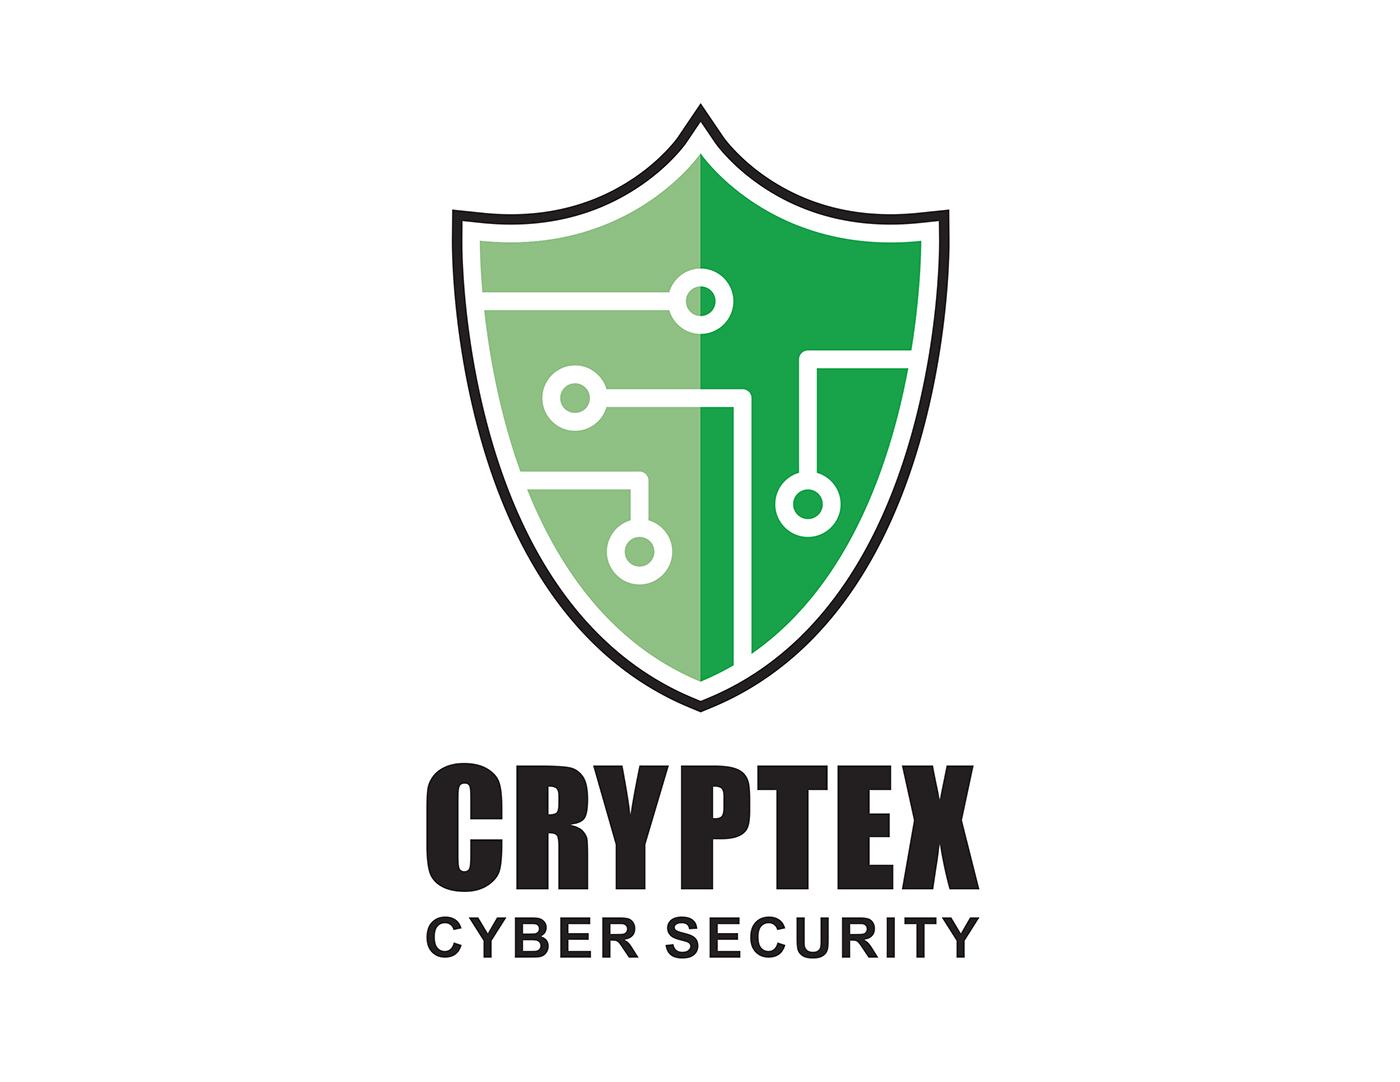 cryptex cyber security logo on behance rh behance net security logo vests security logos free